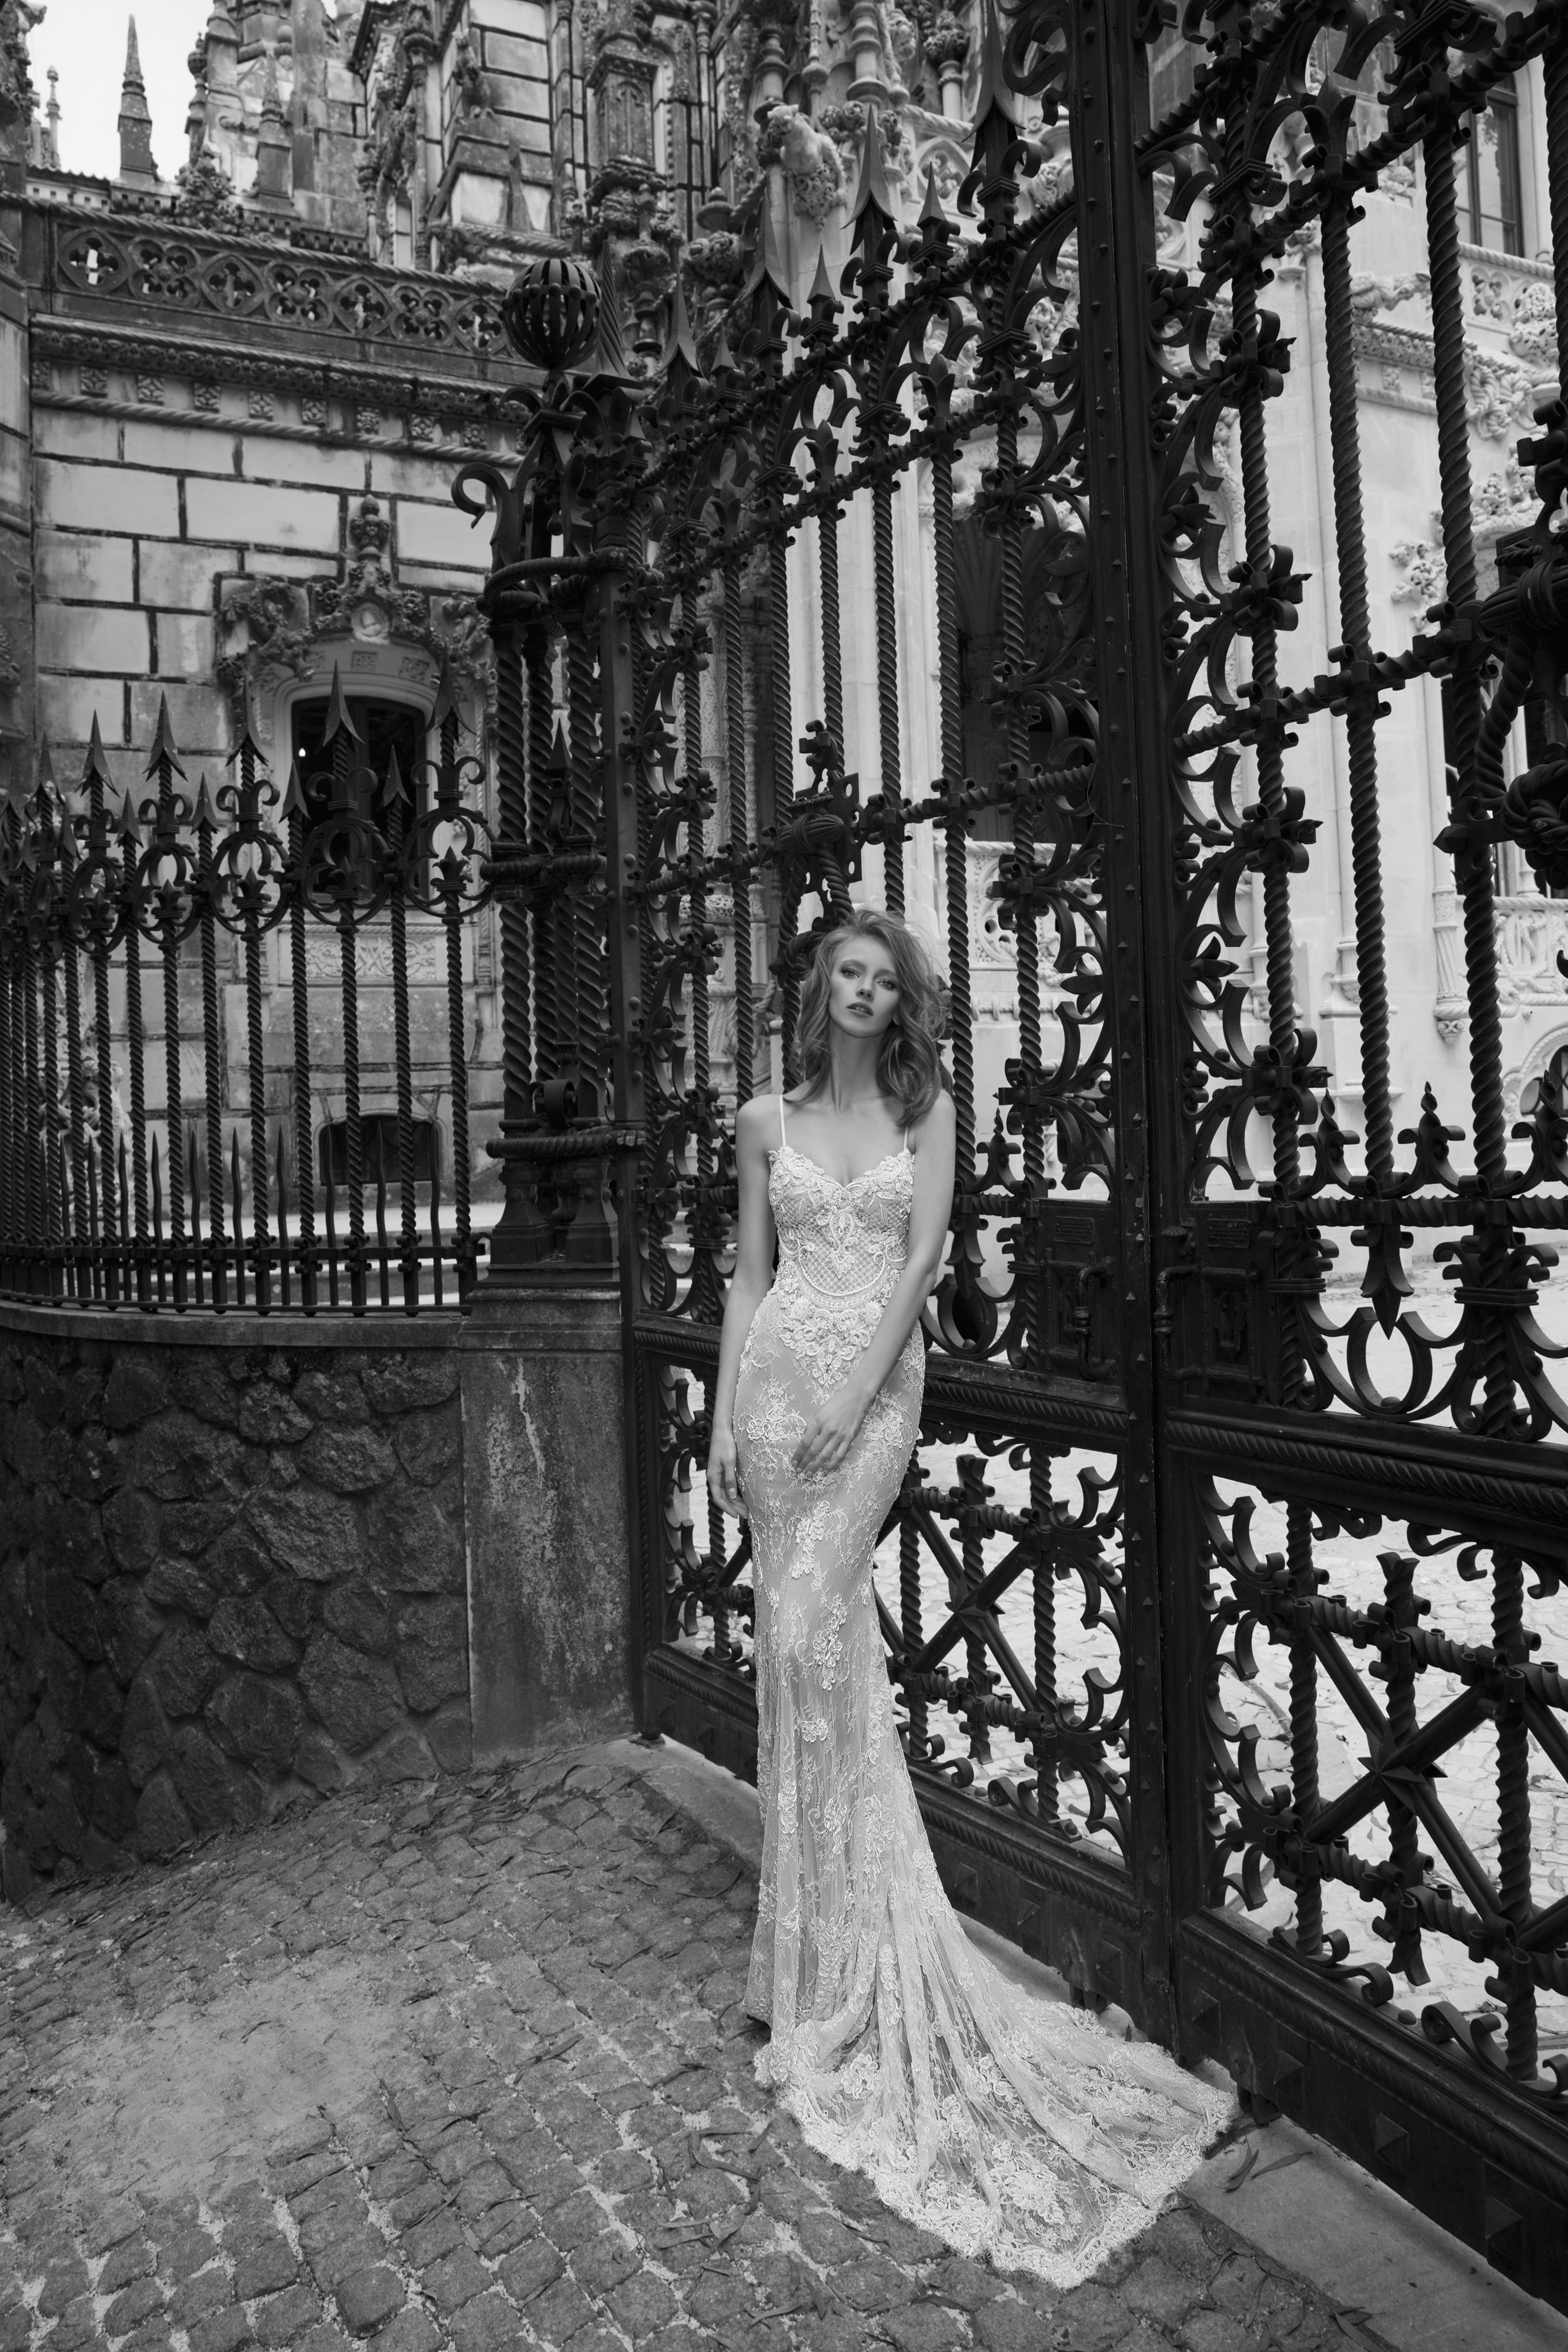 Mira Couture Netta Benshabu Sofhia Wedding Bridal Dress Gown Chicago Boutique Full Front